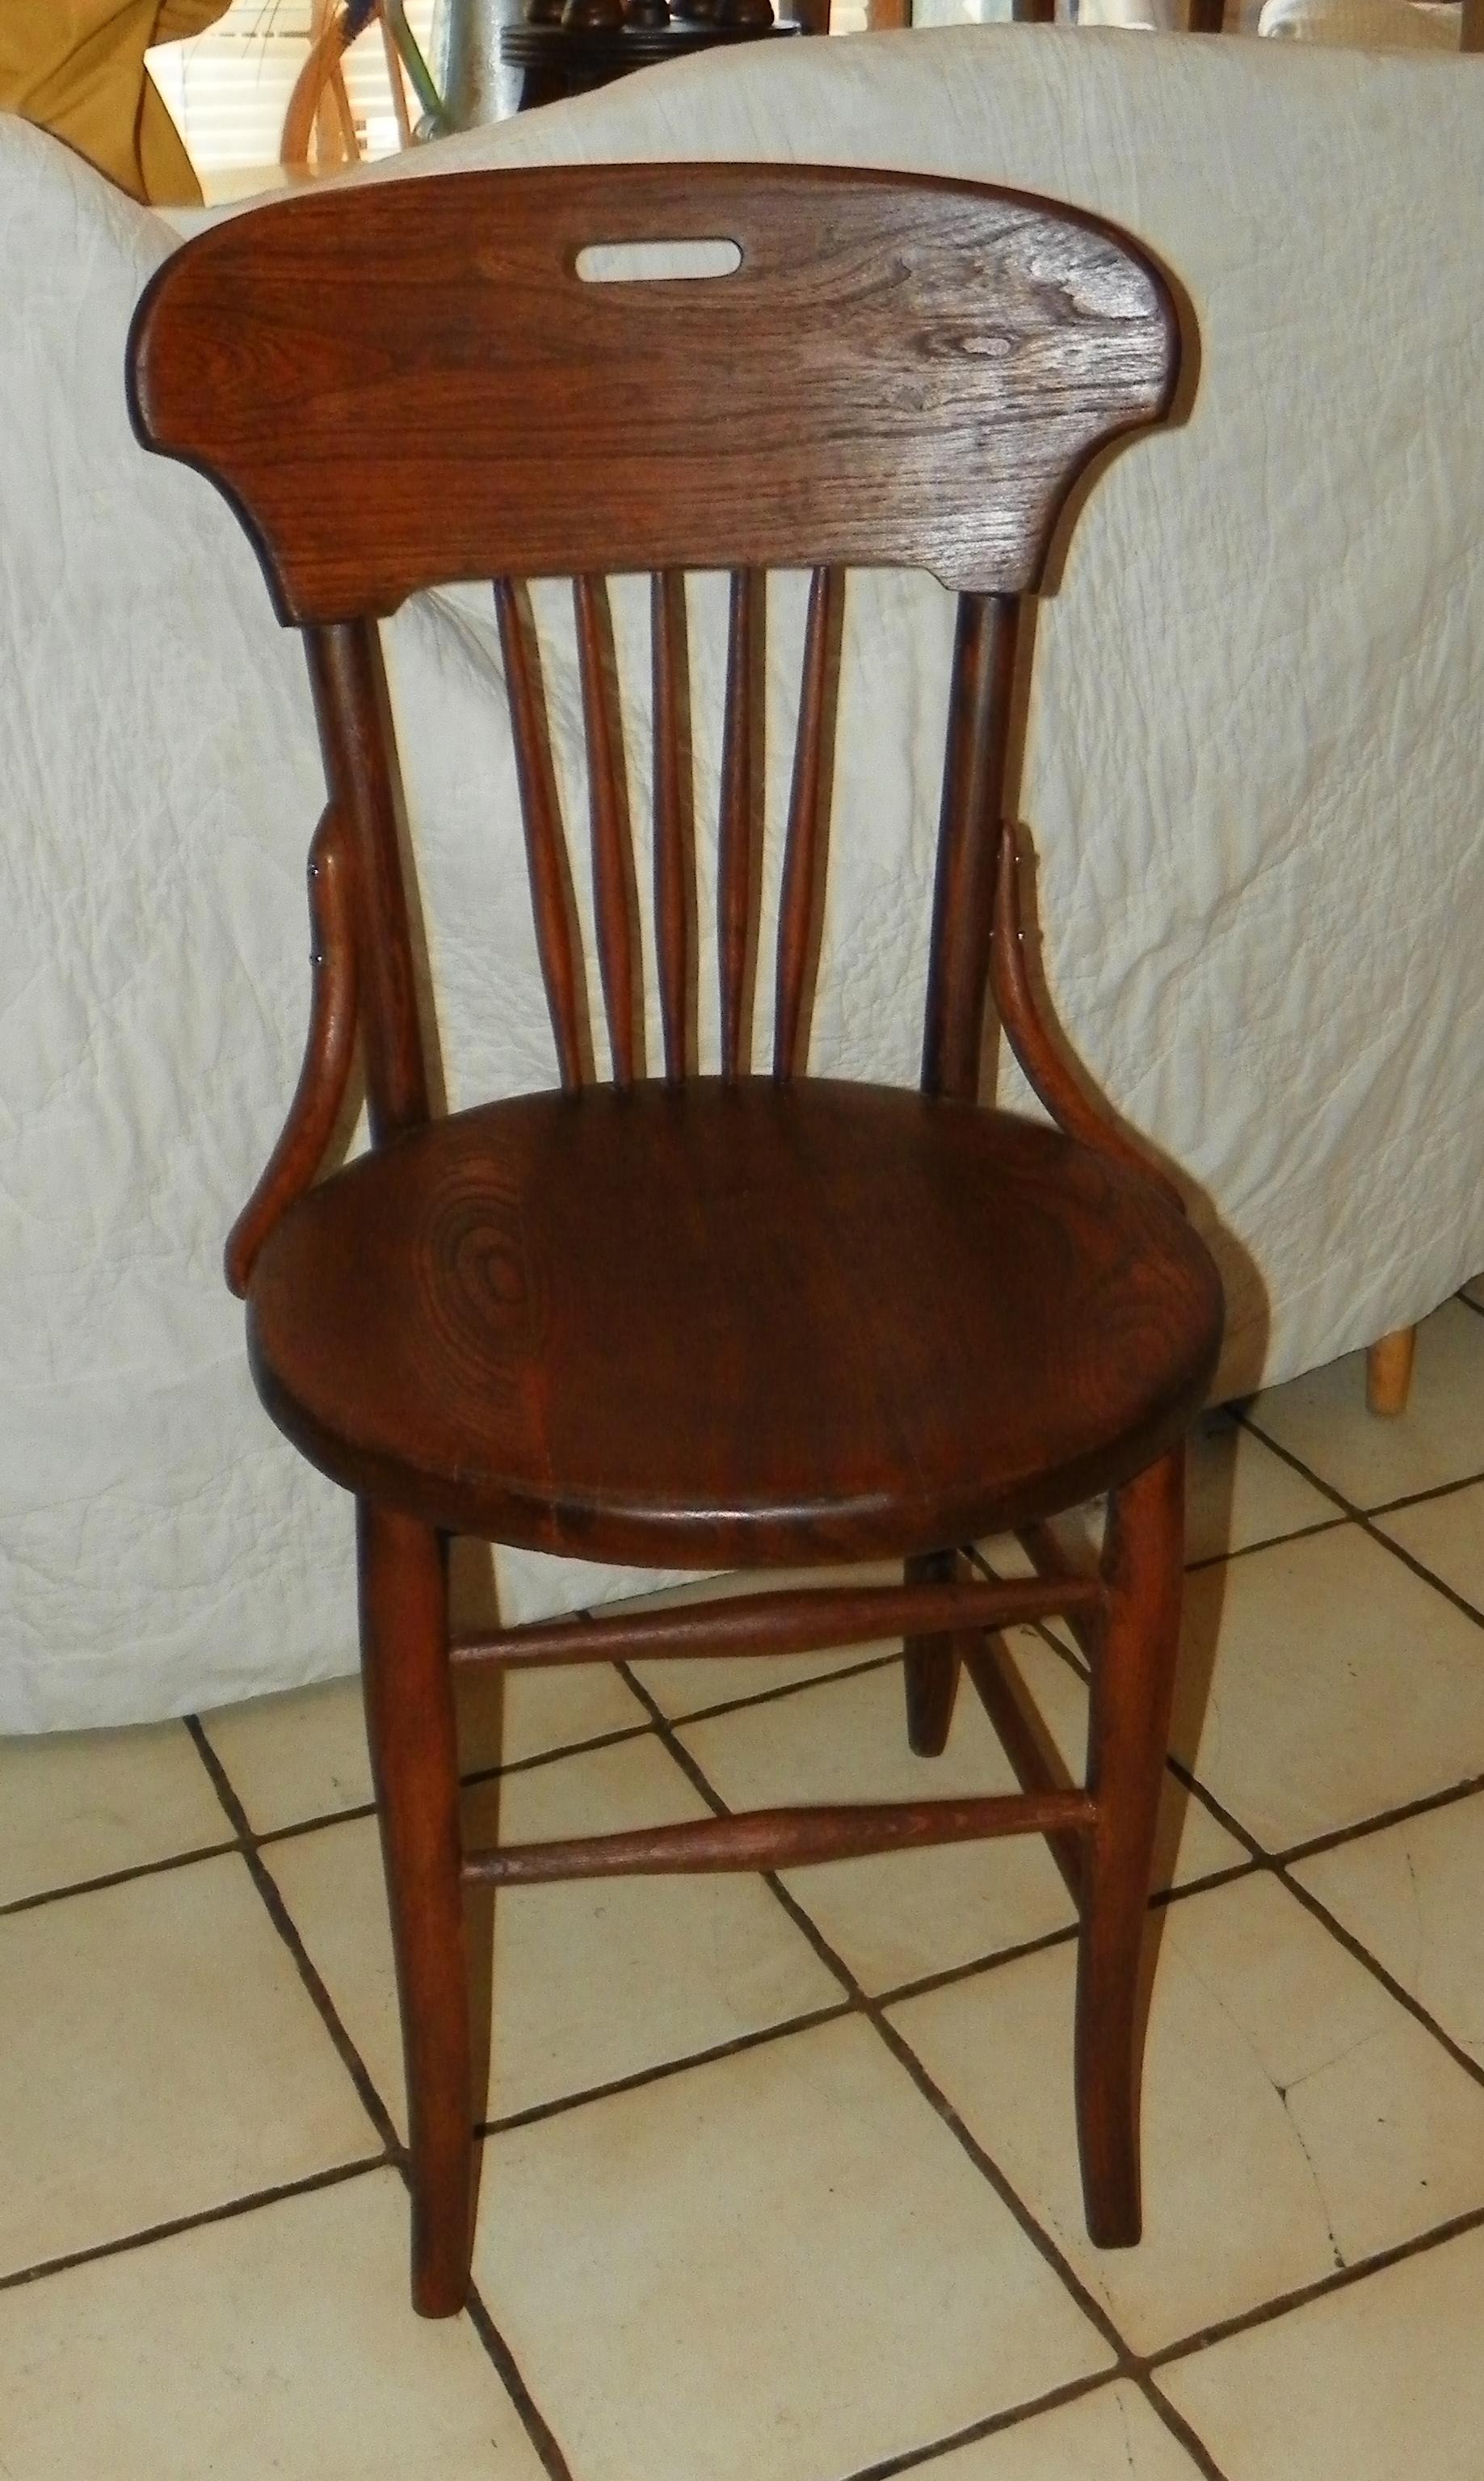 Oak Desk Chair Ice Cream Sidechair SC241 For Sale Classi